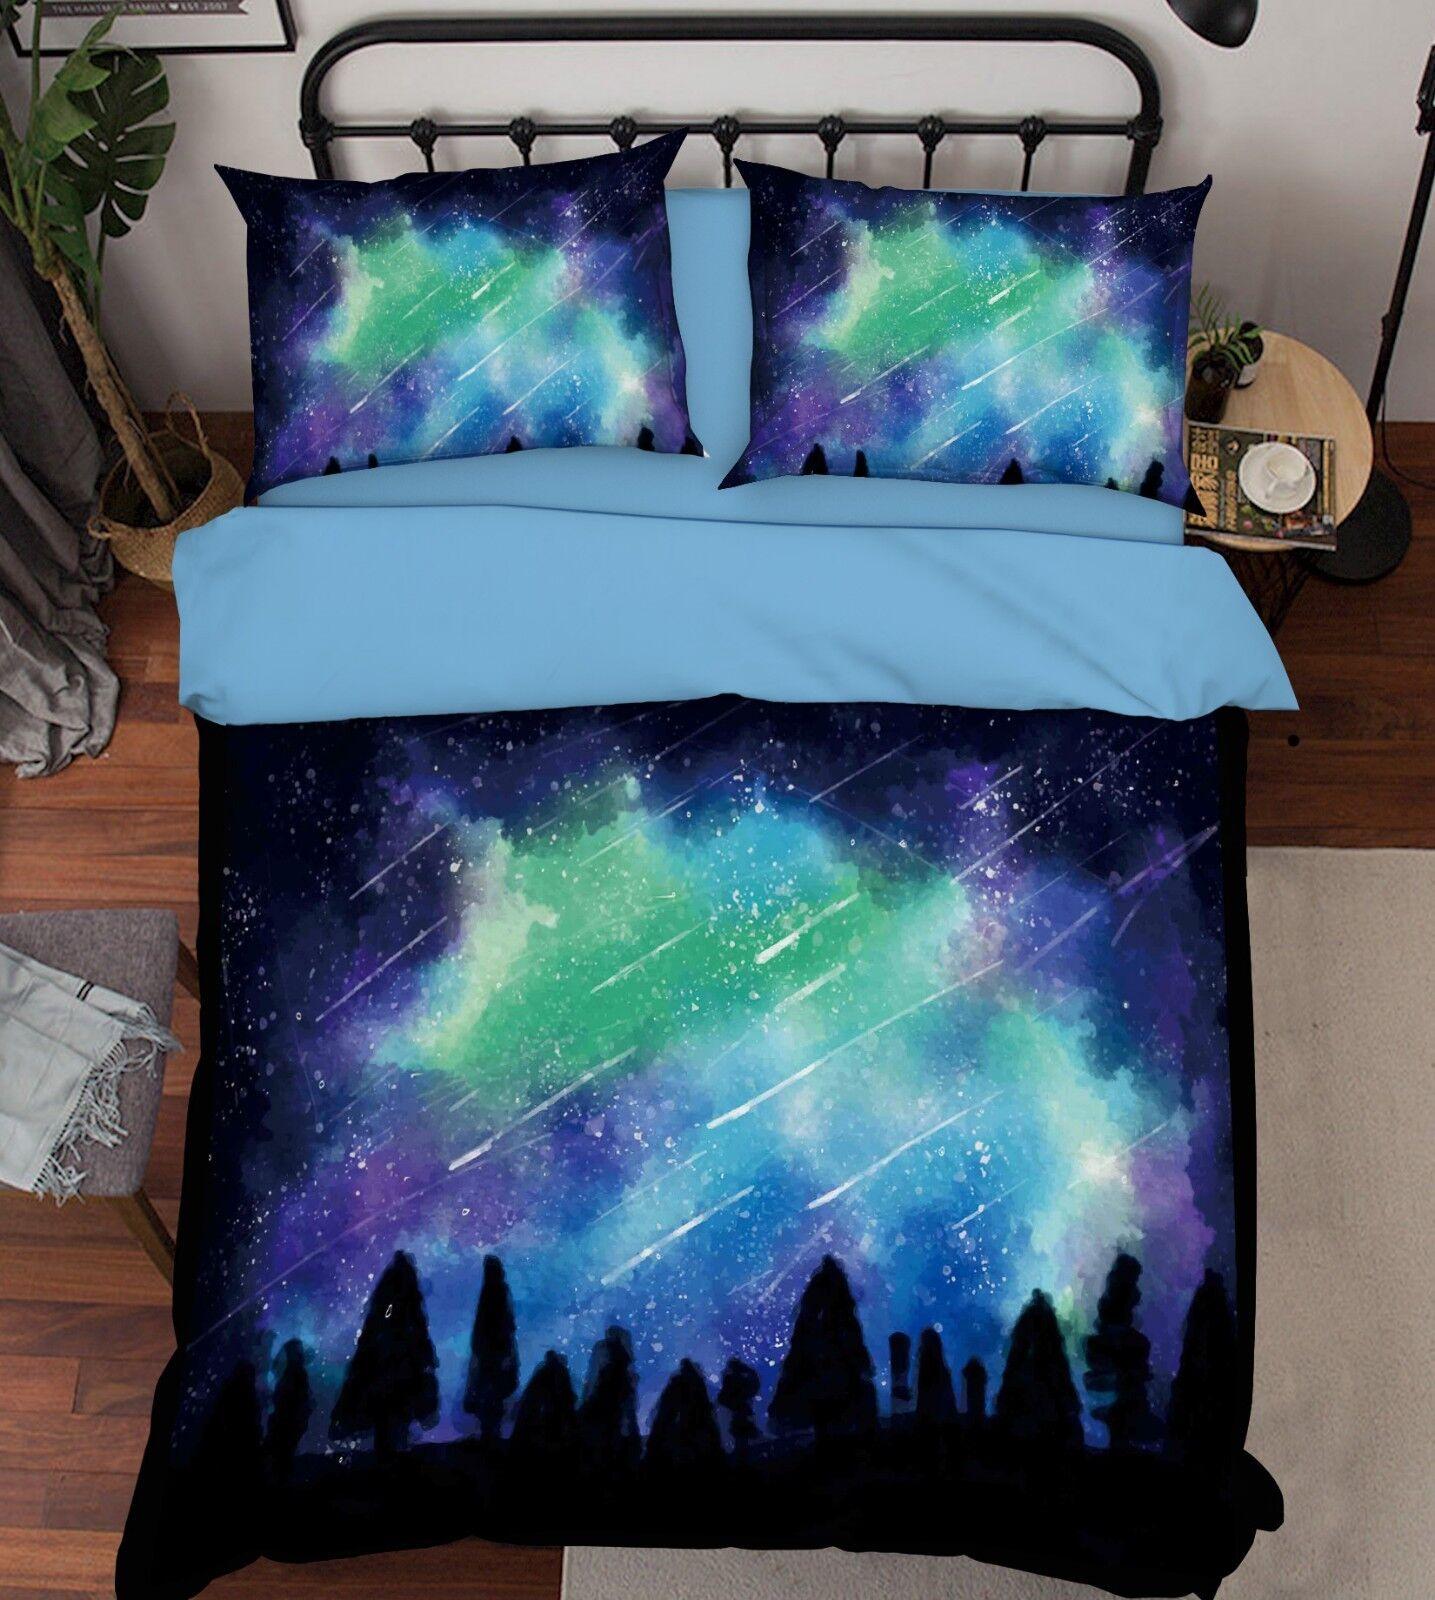 3D Graffiti Mountain7 Bed Pillowcases Quilt Duvet Cover Set Single Queen King CA